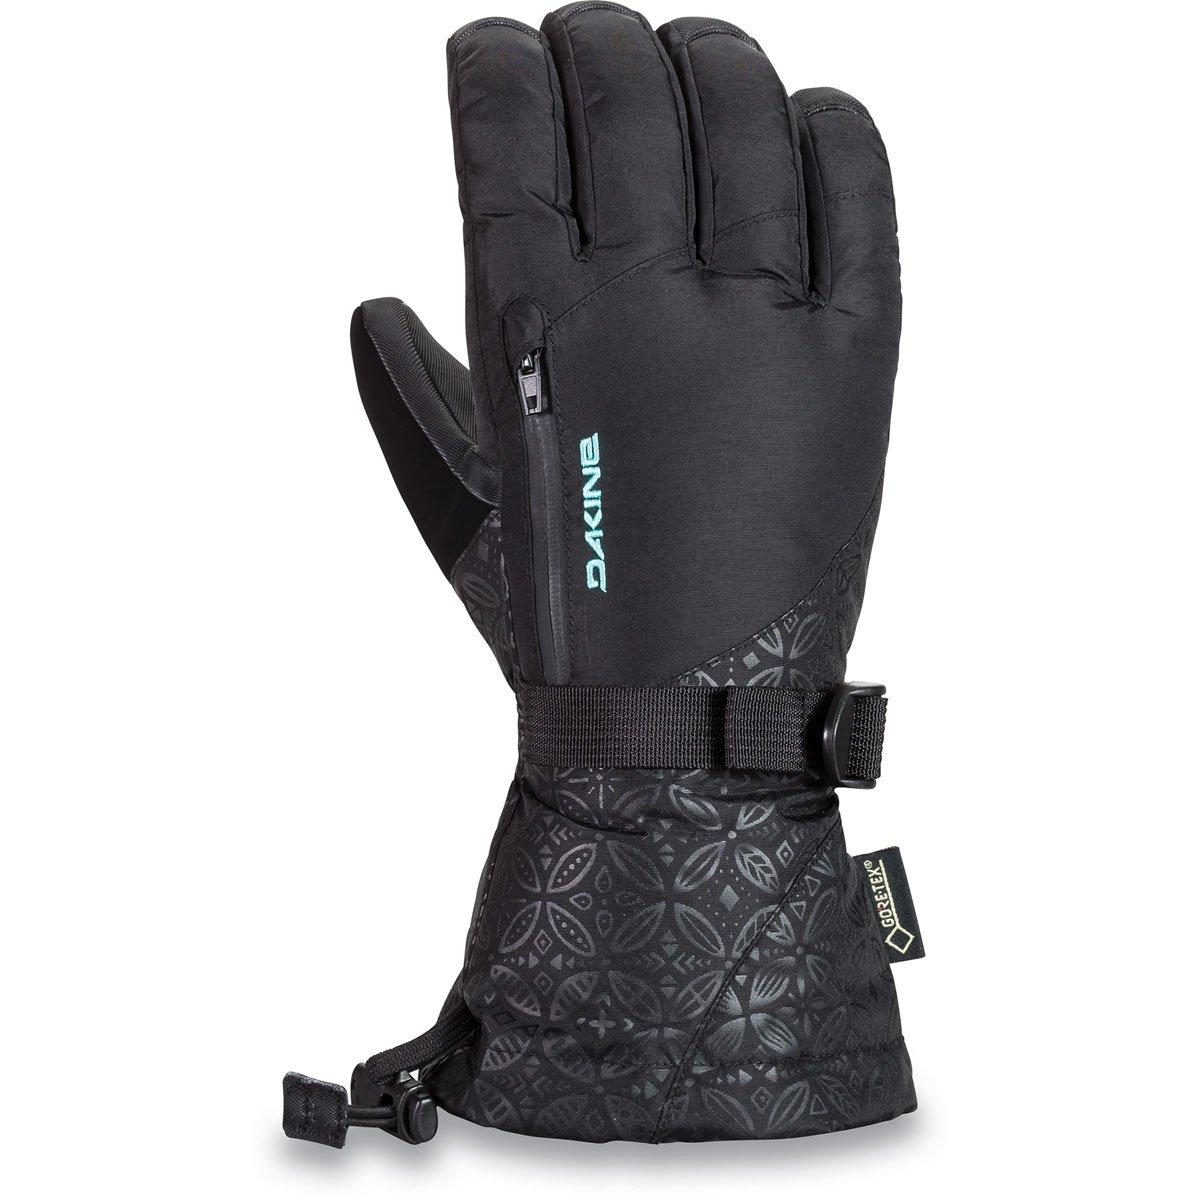 Dakine Sequoia GORE-TEX Gloves